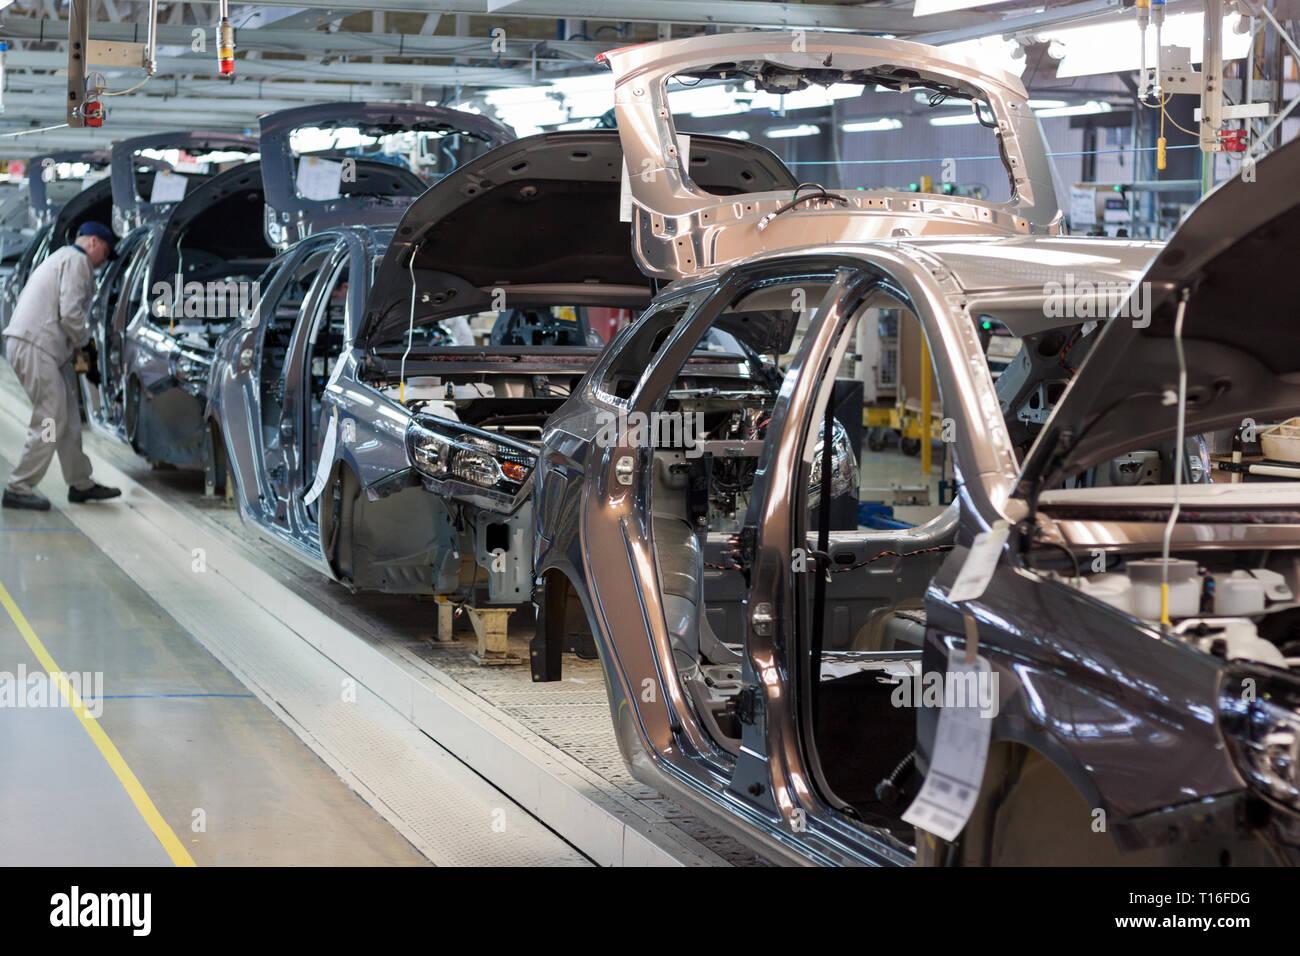 Russia, Izhevsk - December 15, 2018: LADA Automobile Plant Izhevsk, part of the AVTOVAZ Group. Assembly new cars on the conveyor line. Stock Photo